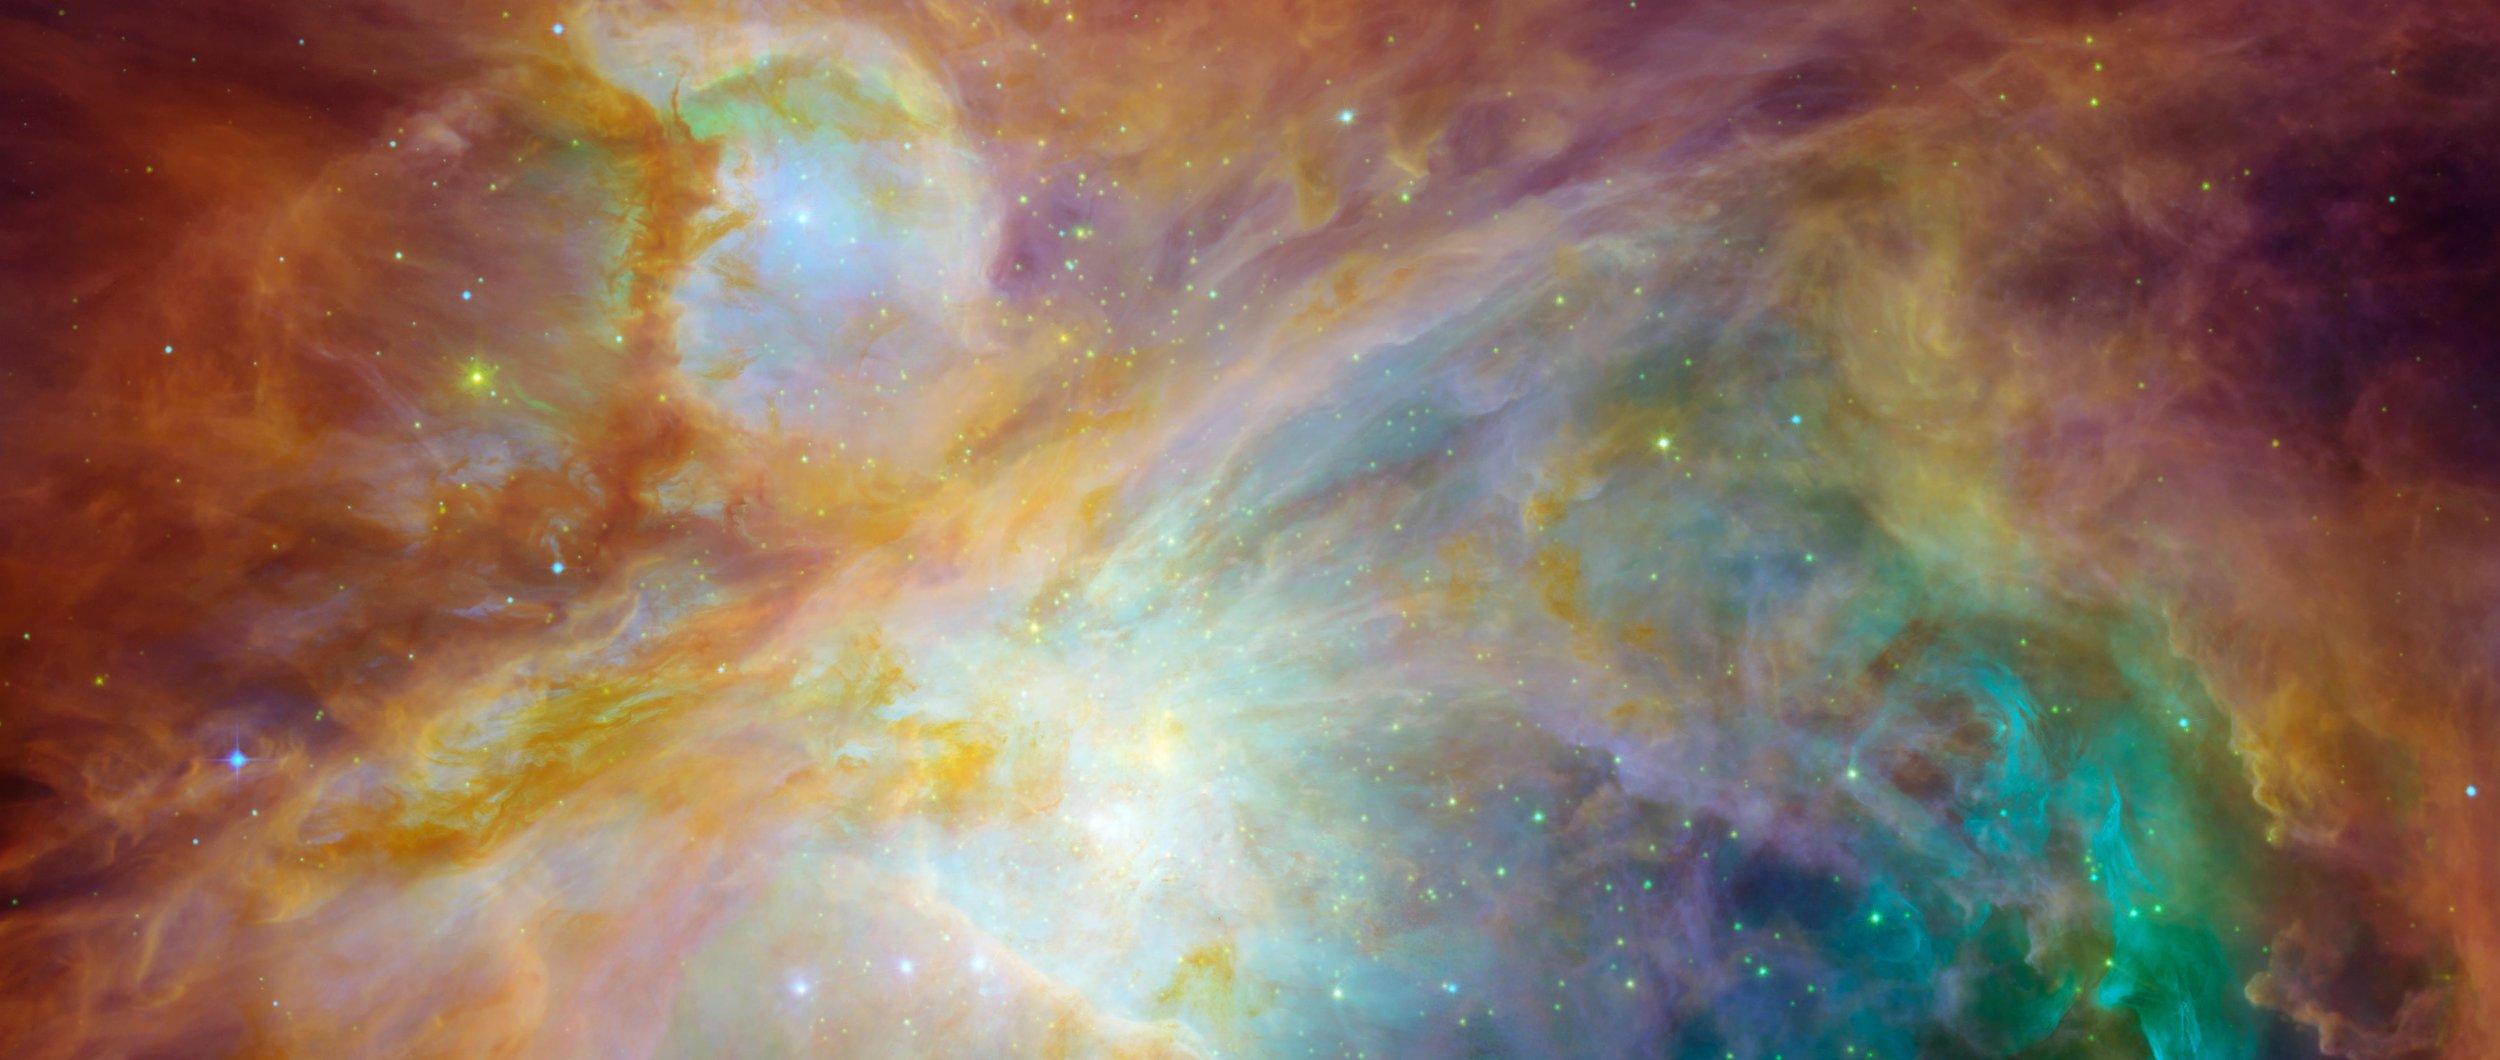 The Healing Cosmos.jpg